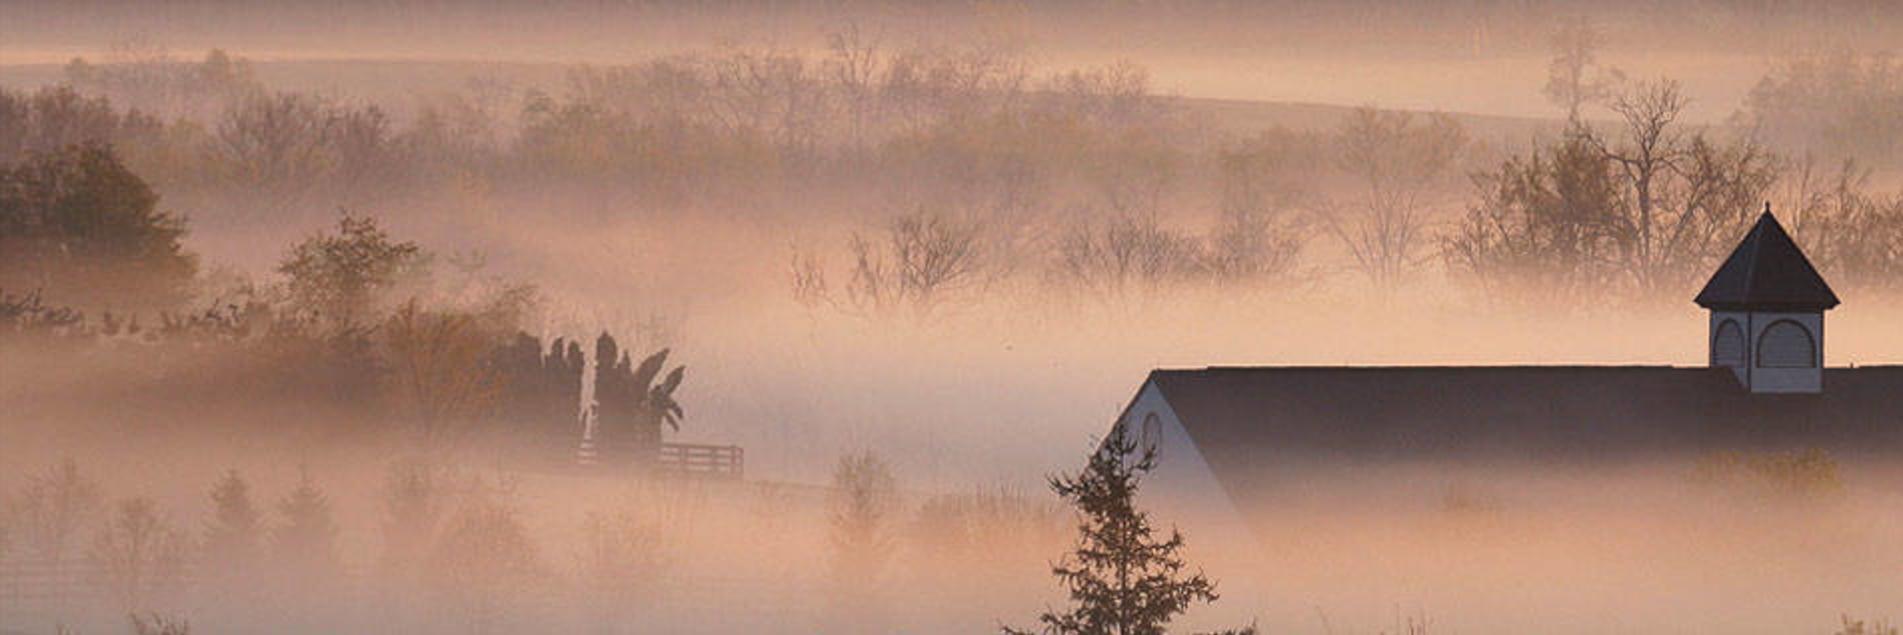 Foggy Bluegrass Morning